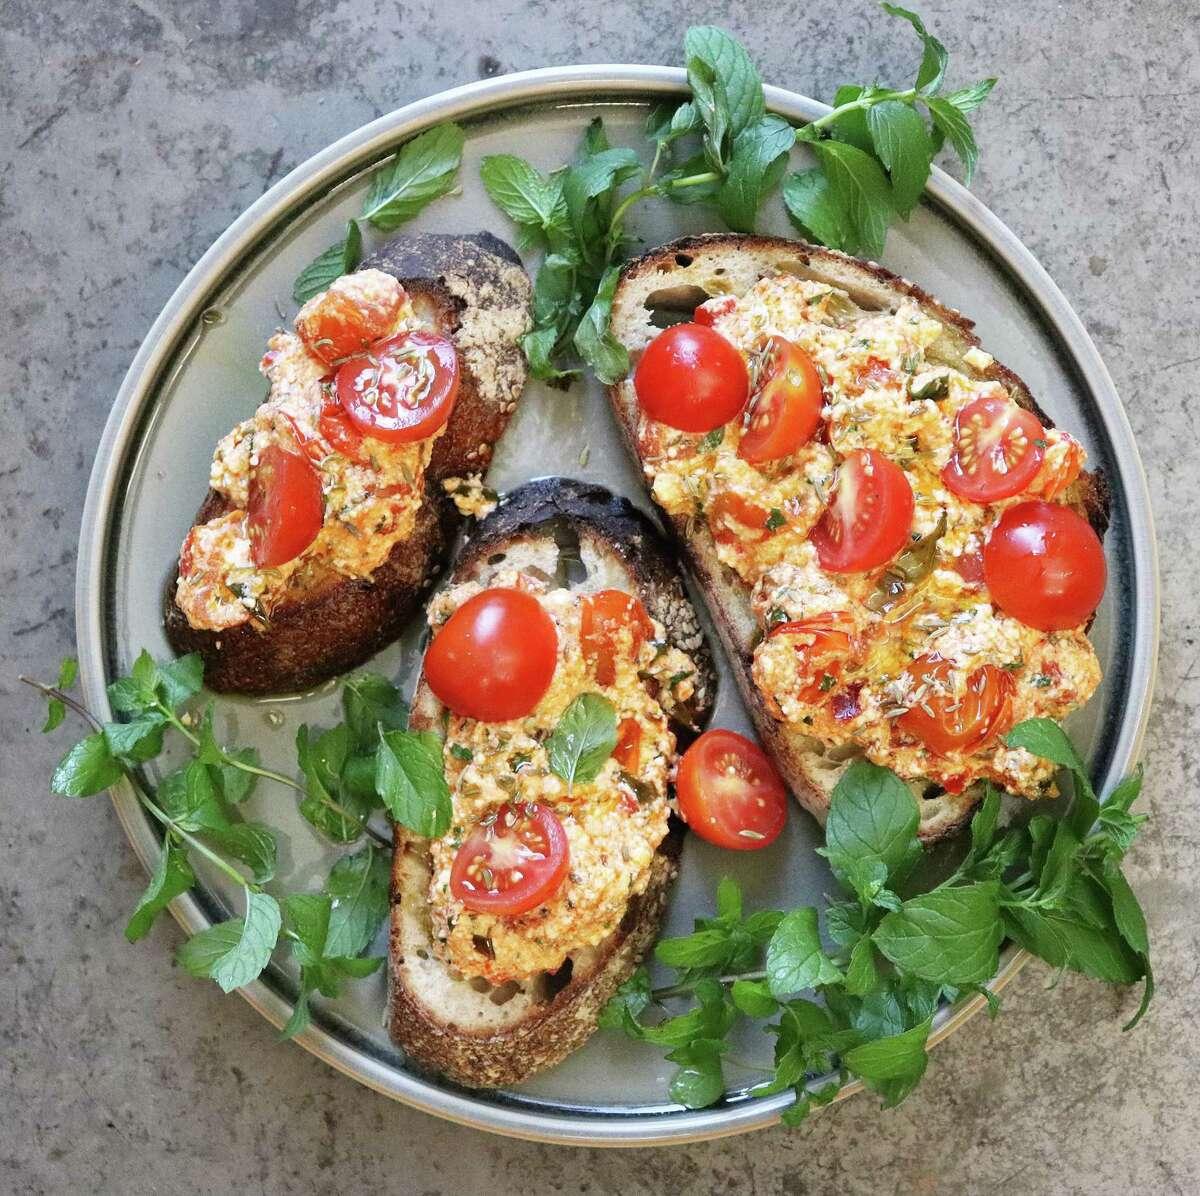 Tomato Ricotta Toast is a delightful seasonal breakfast or appetizer.